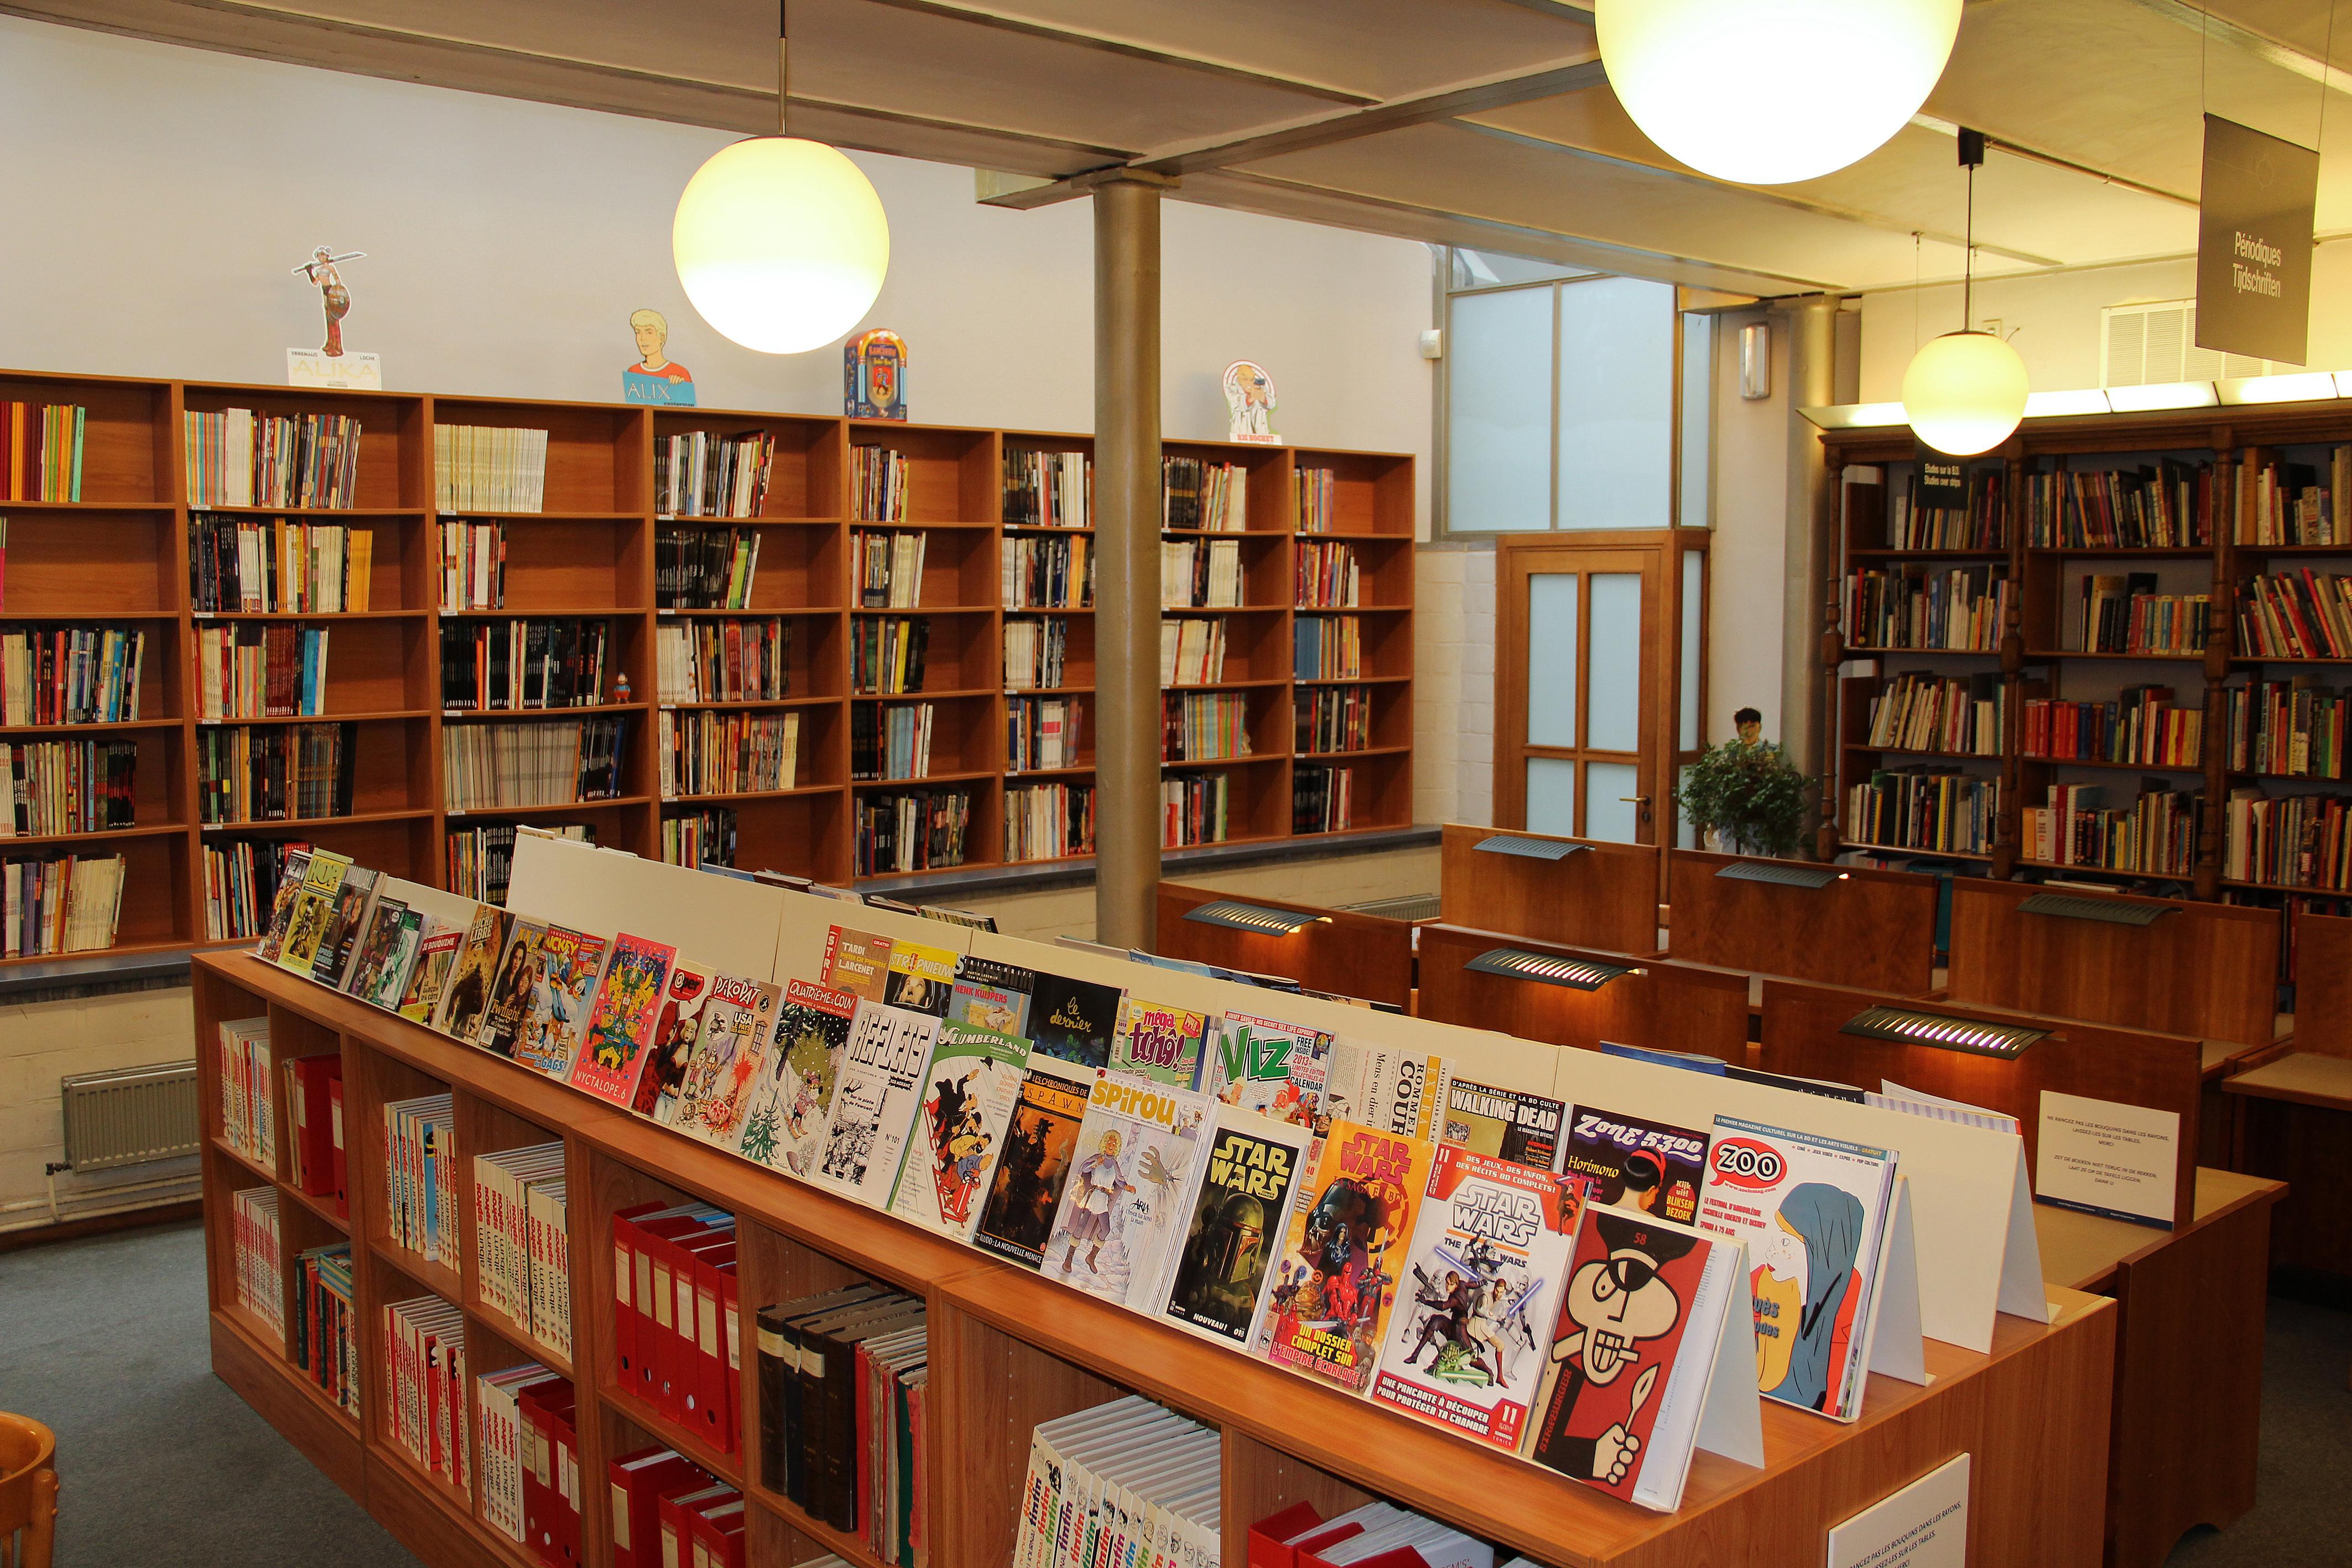 la biblioth que d tude centre belge de la bande dessin e mus e bruxelles. Black Bedroom Furniture Sets. Home Design Ideas